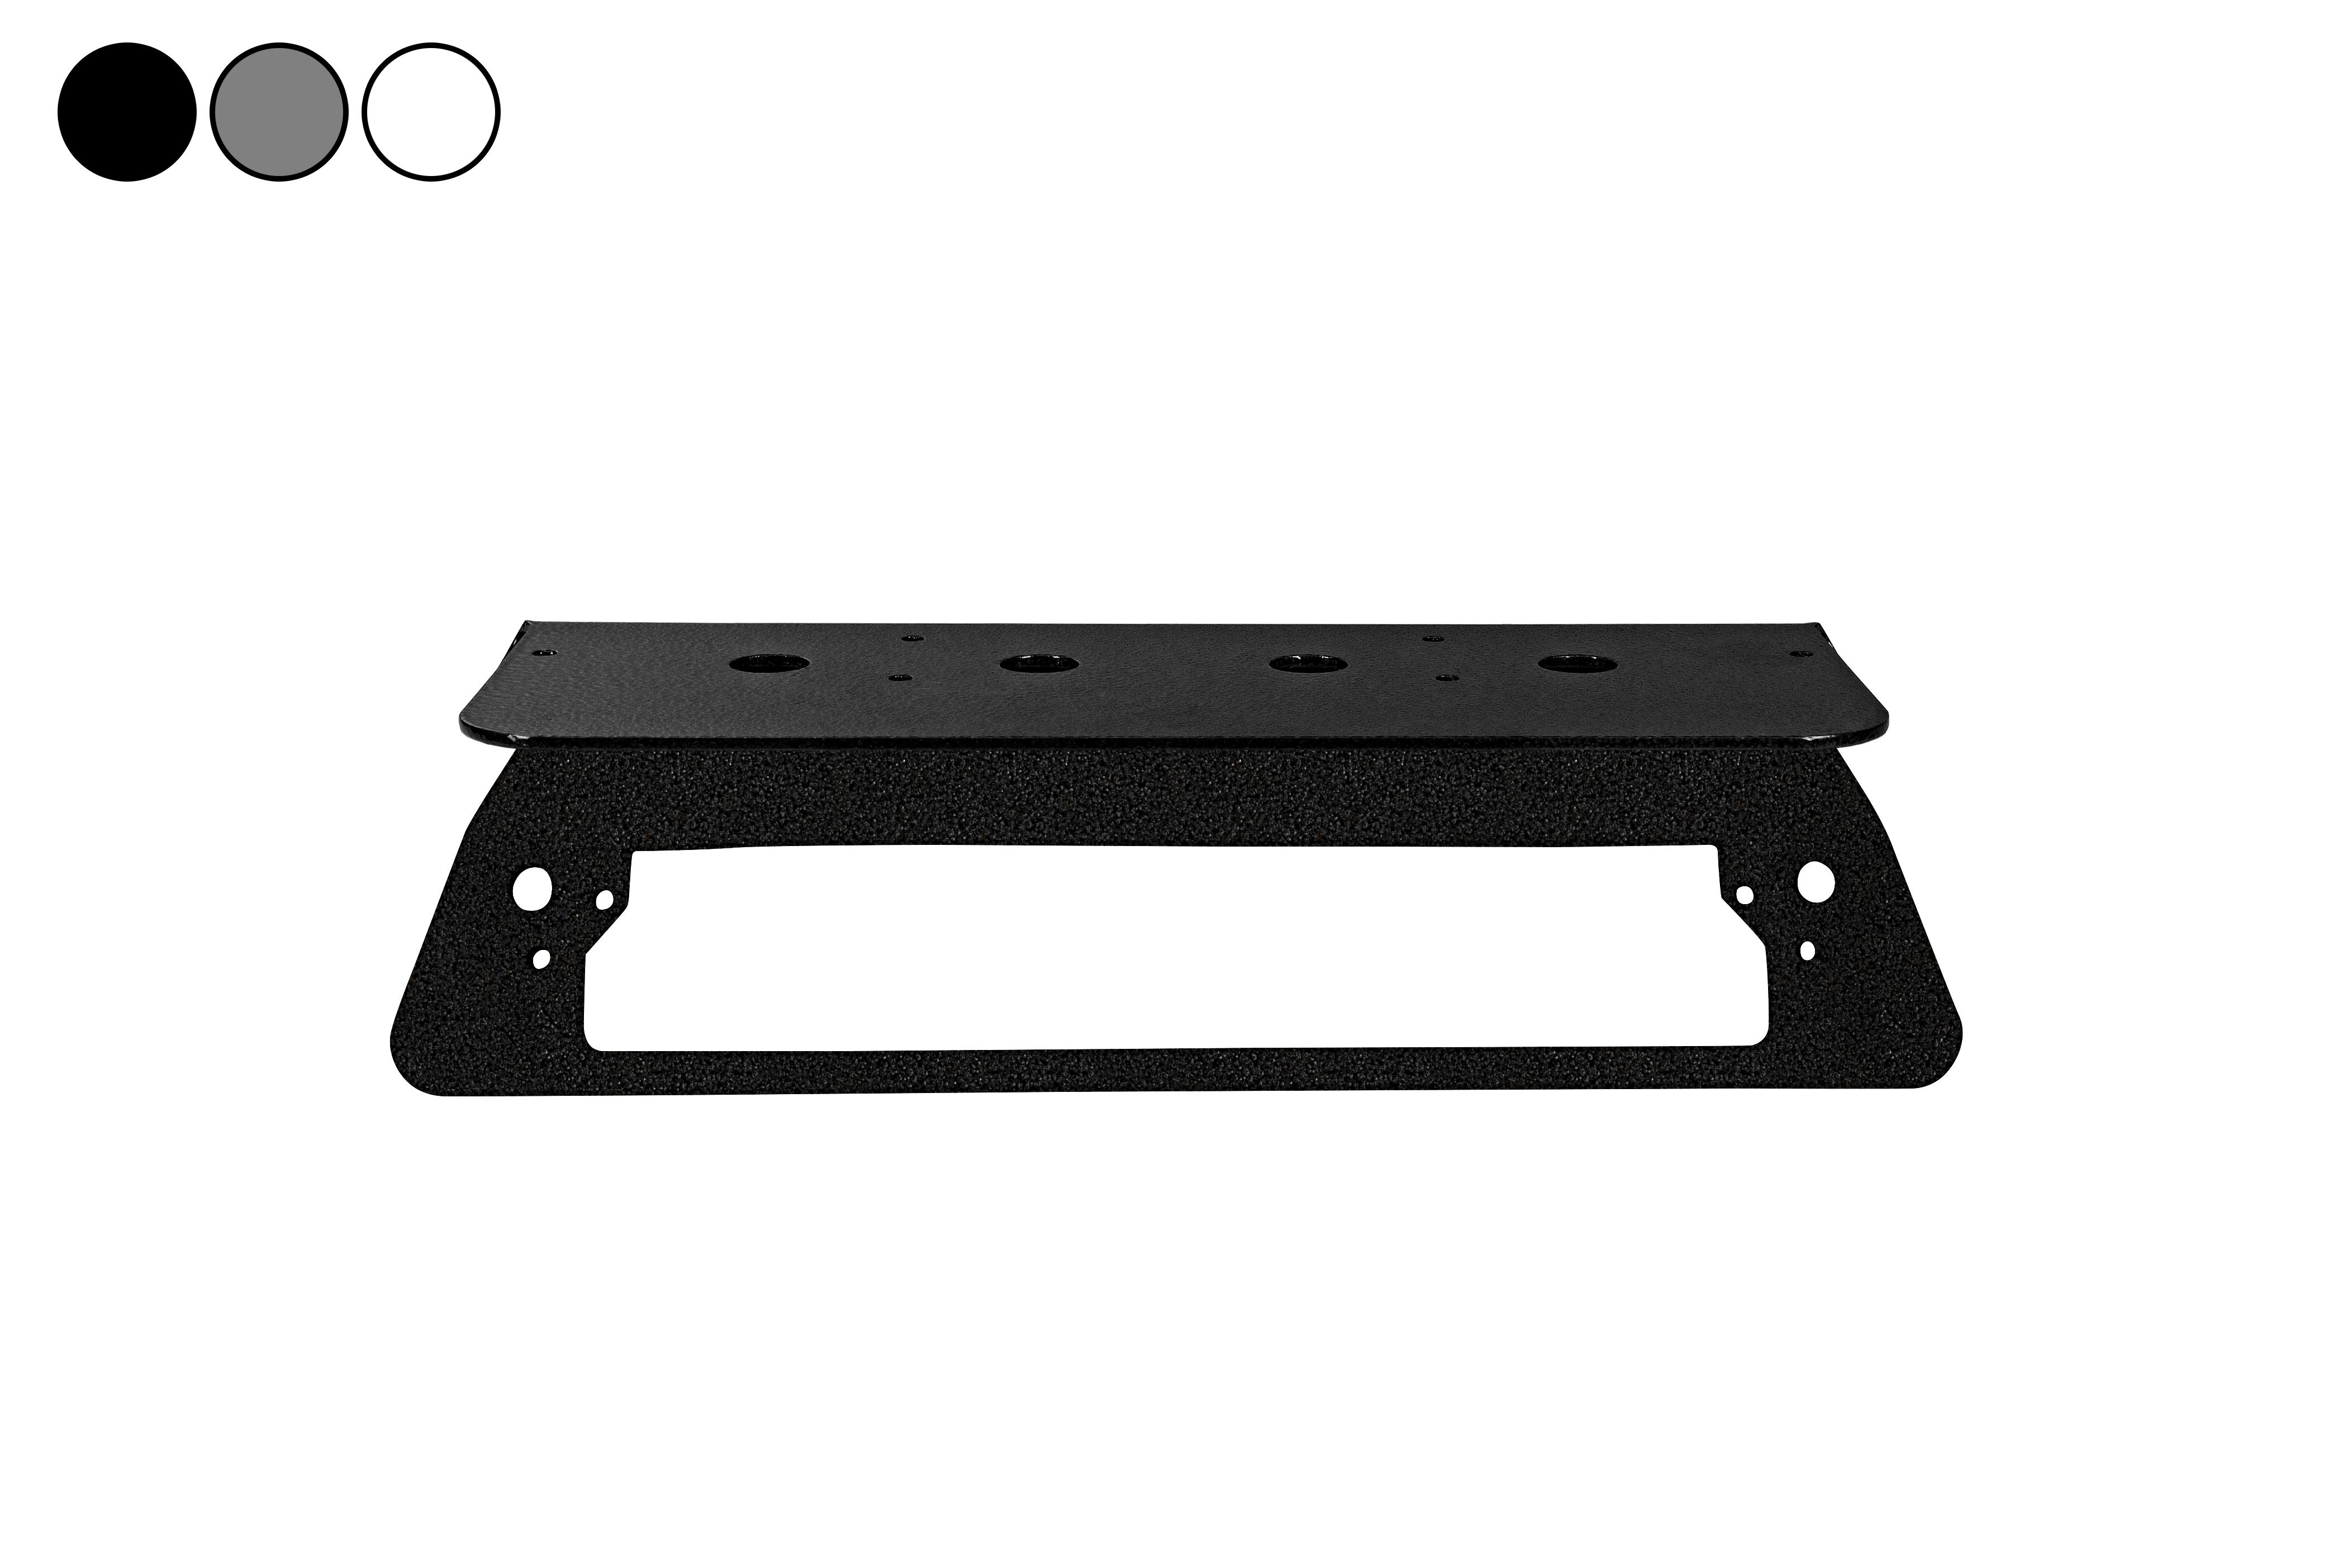 Antenna Permanent Mounting Plate for 2016 Chevrolet Silverado 1500, 1500HD, 2500HD, 3500HD trucks -